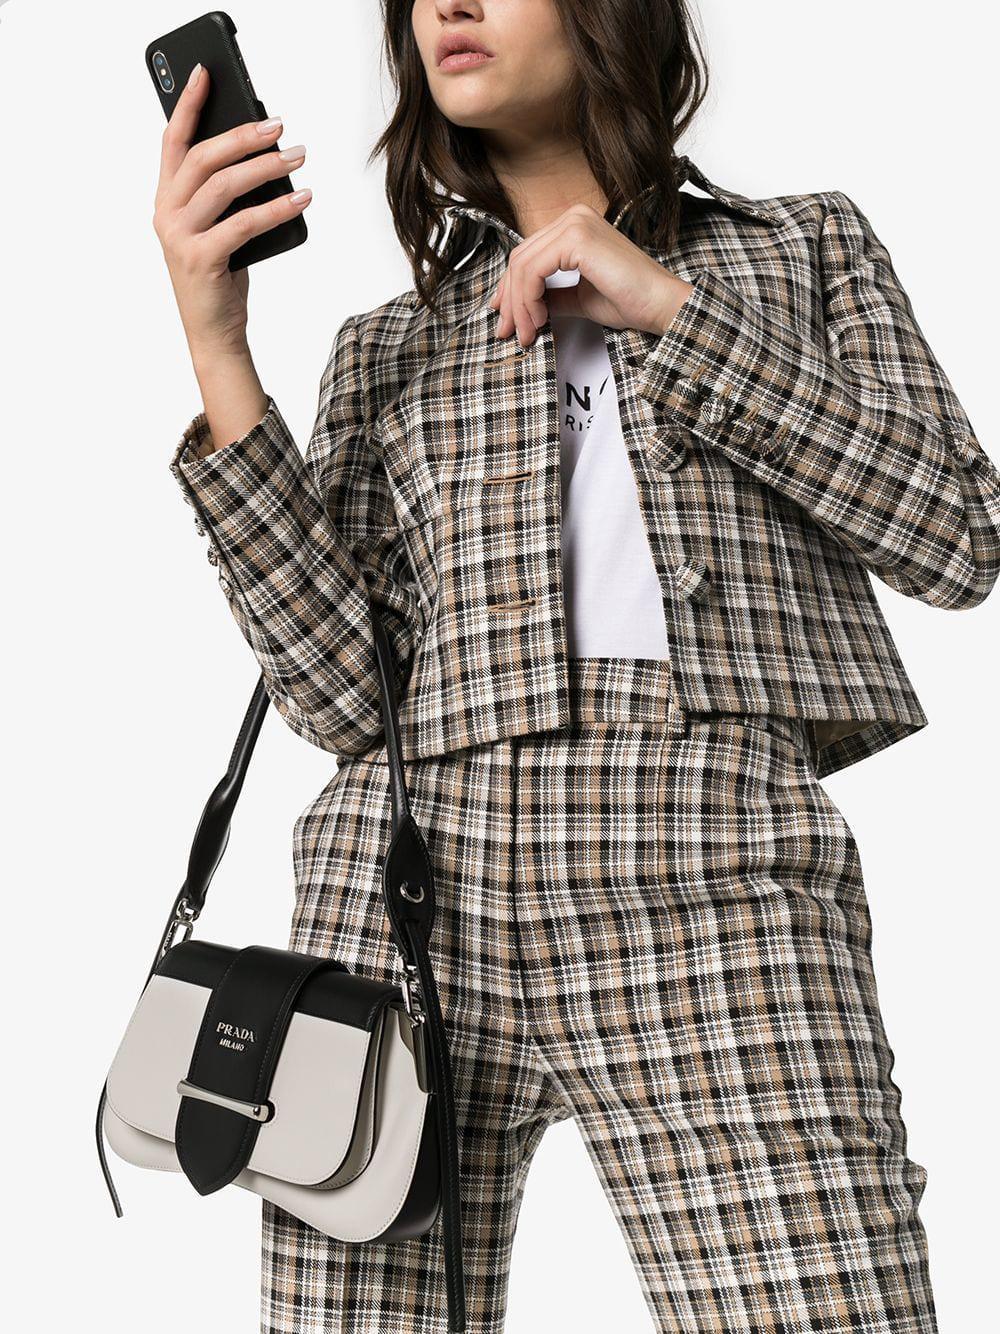 86e4fd6a2e Prada - Black And White Manuelle Two Tone Leather Shoulder Bag - Lyst. View  fullscreen